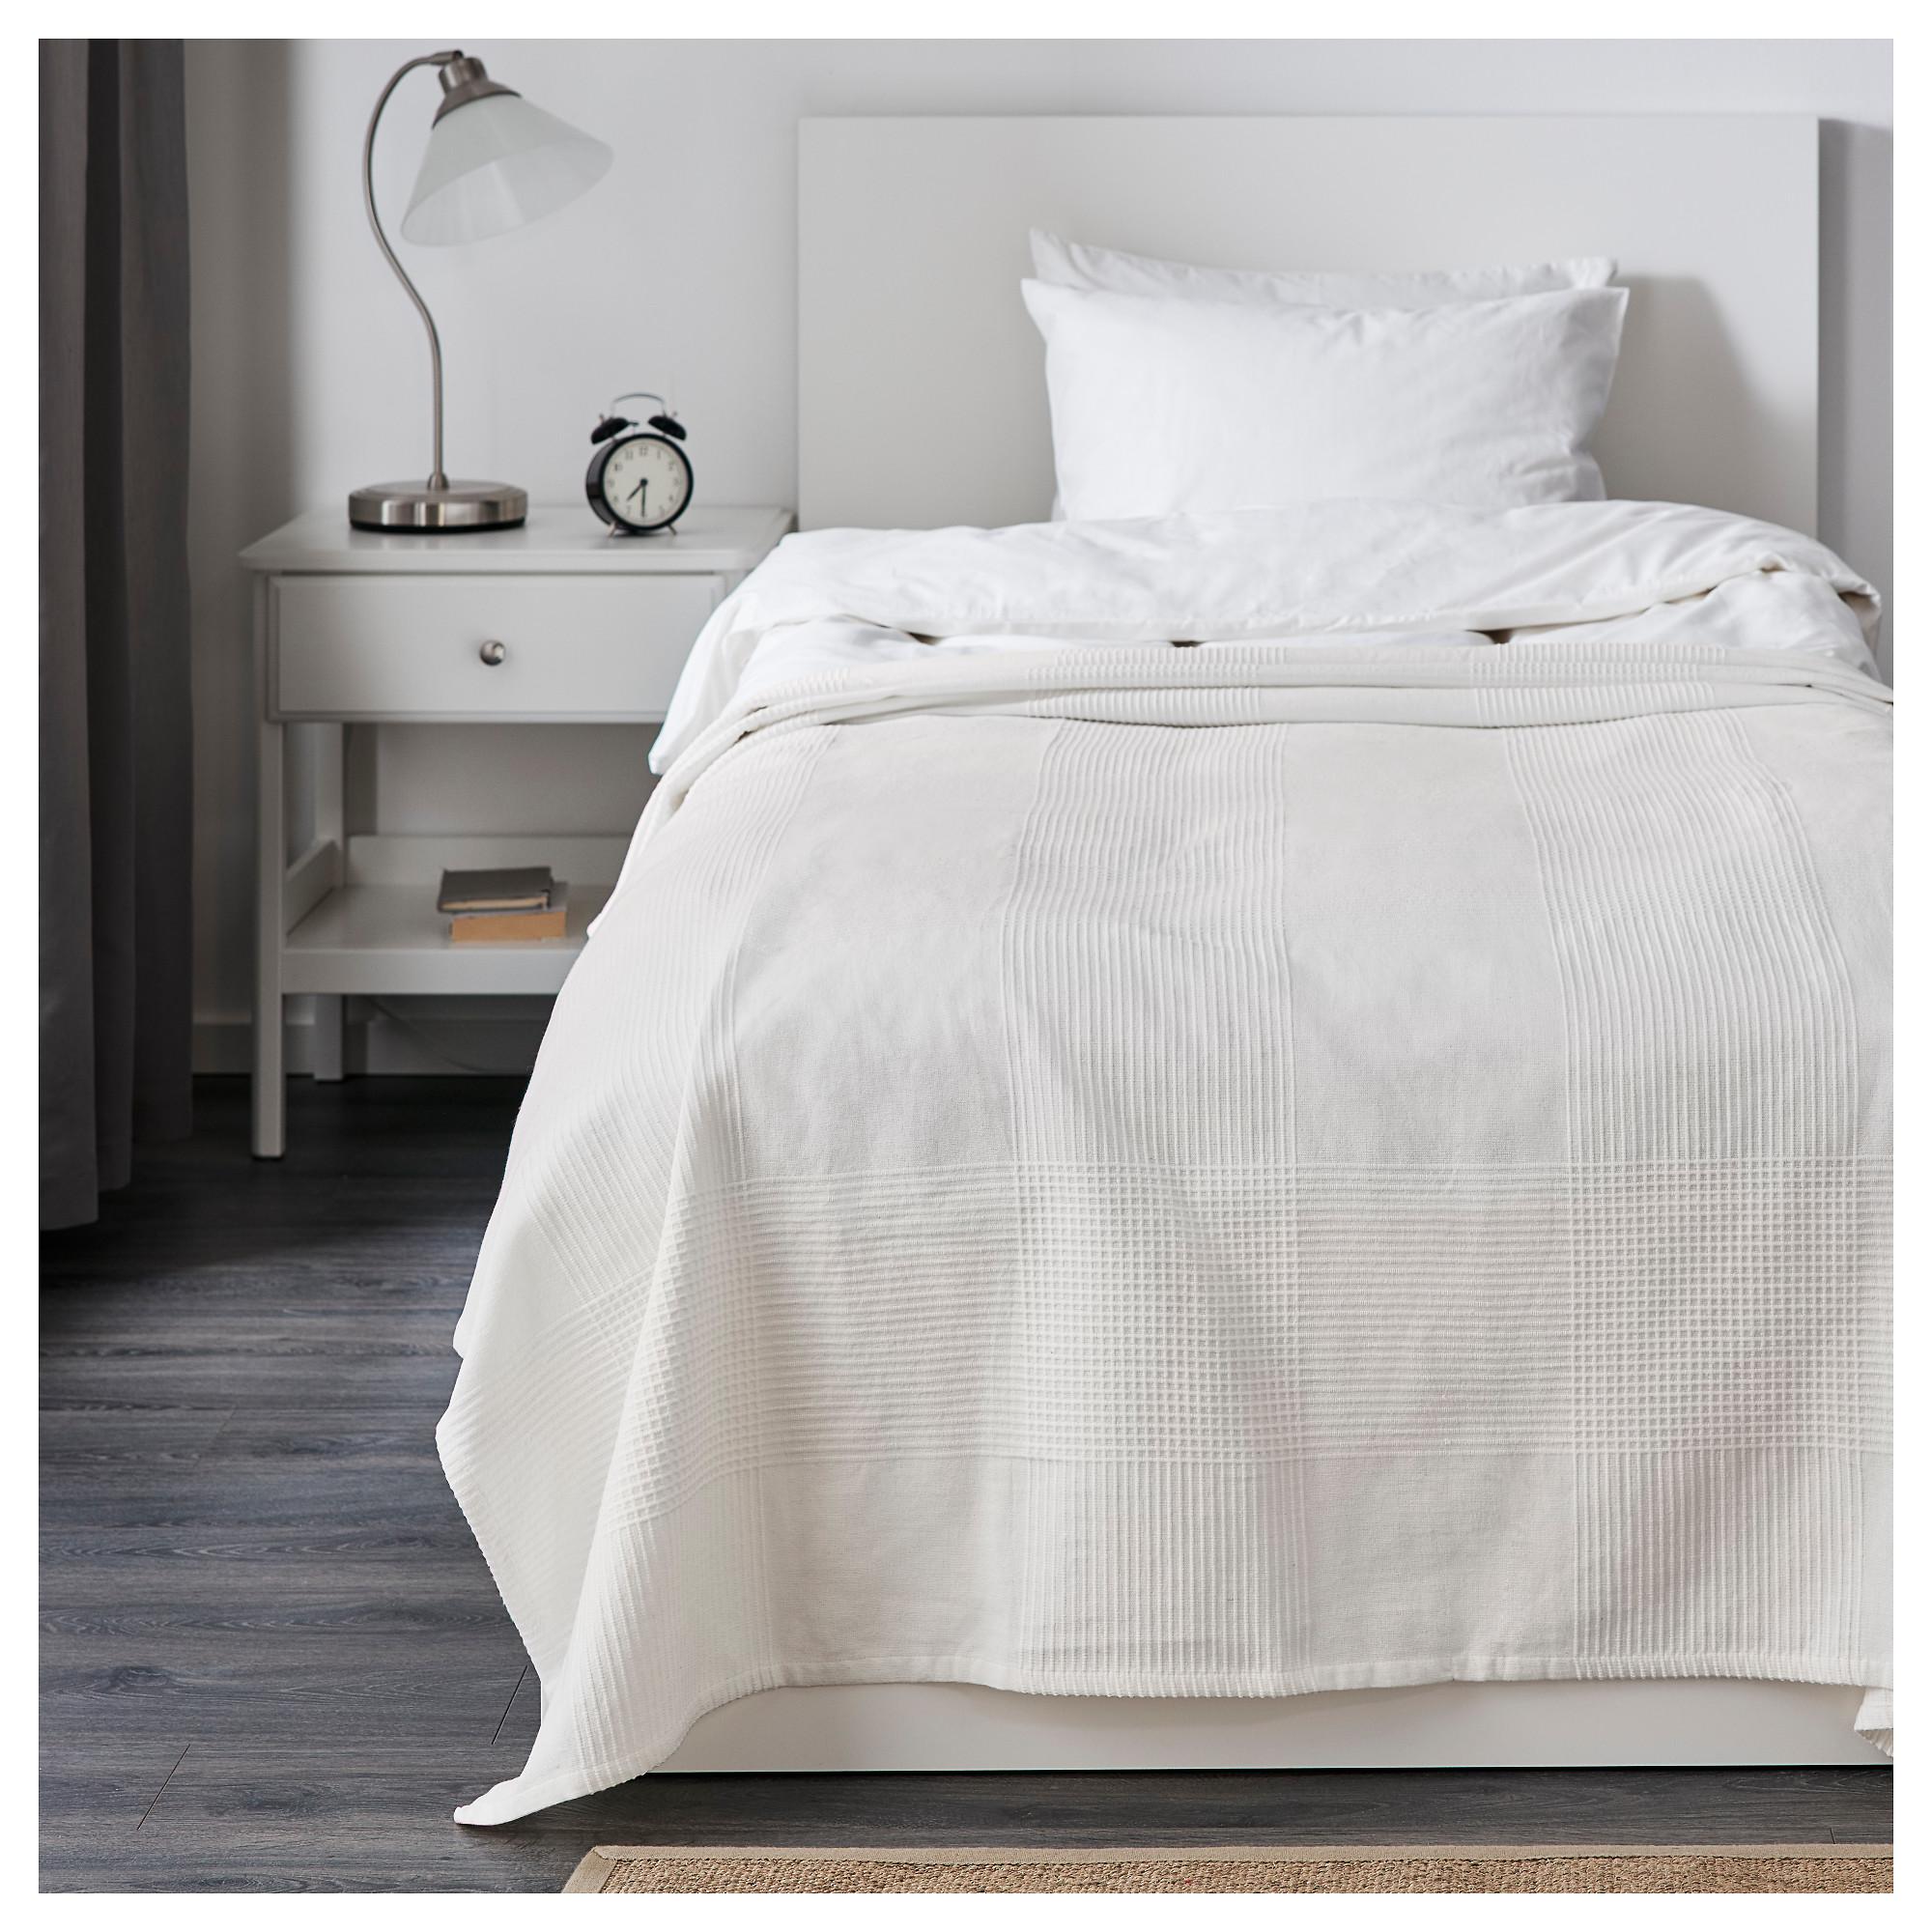 Textiles for bedroom IKEA